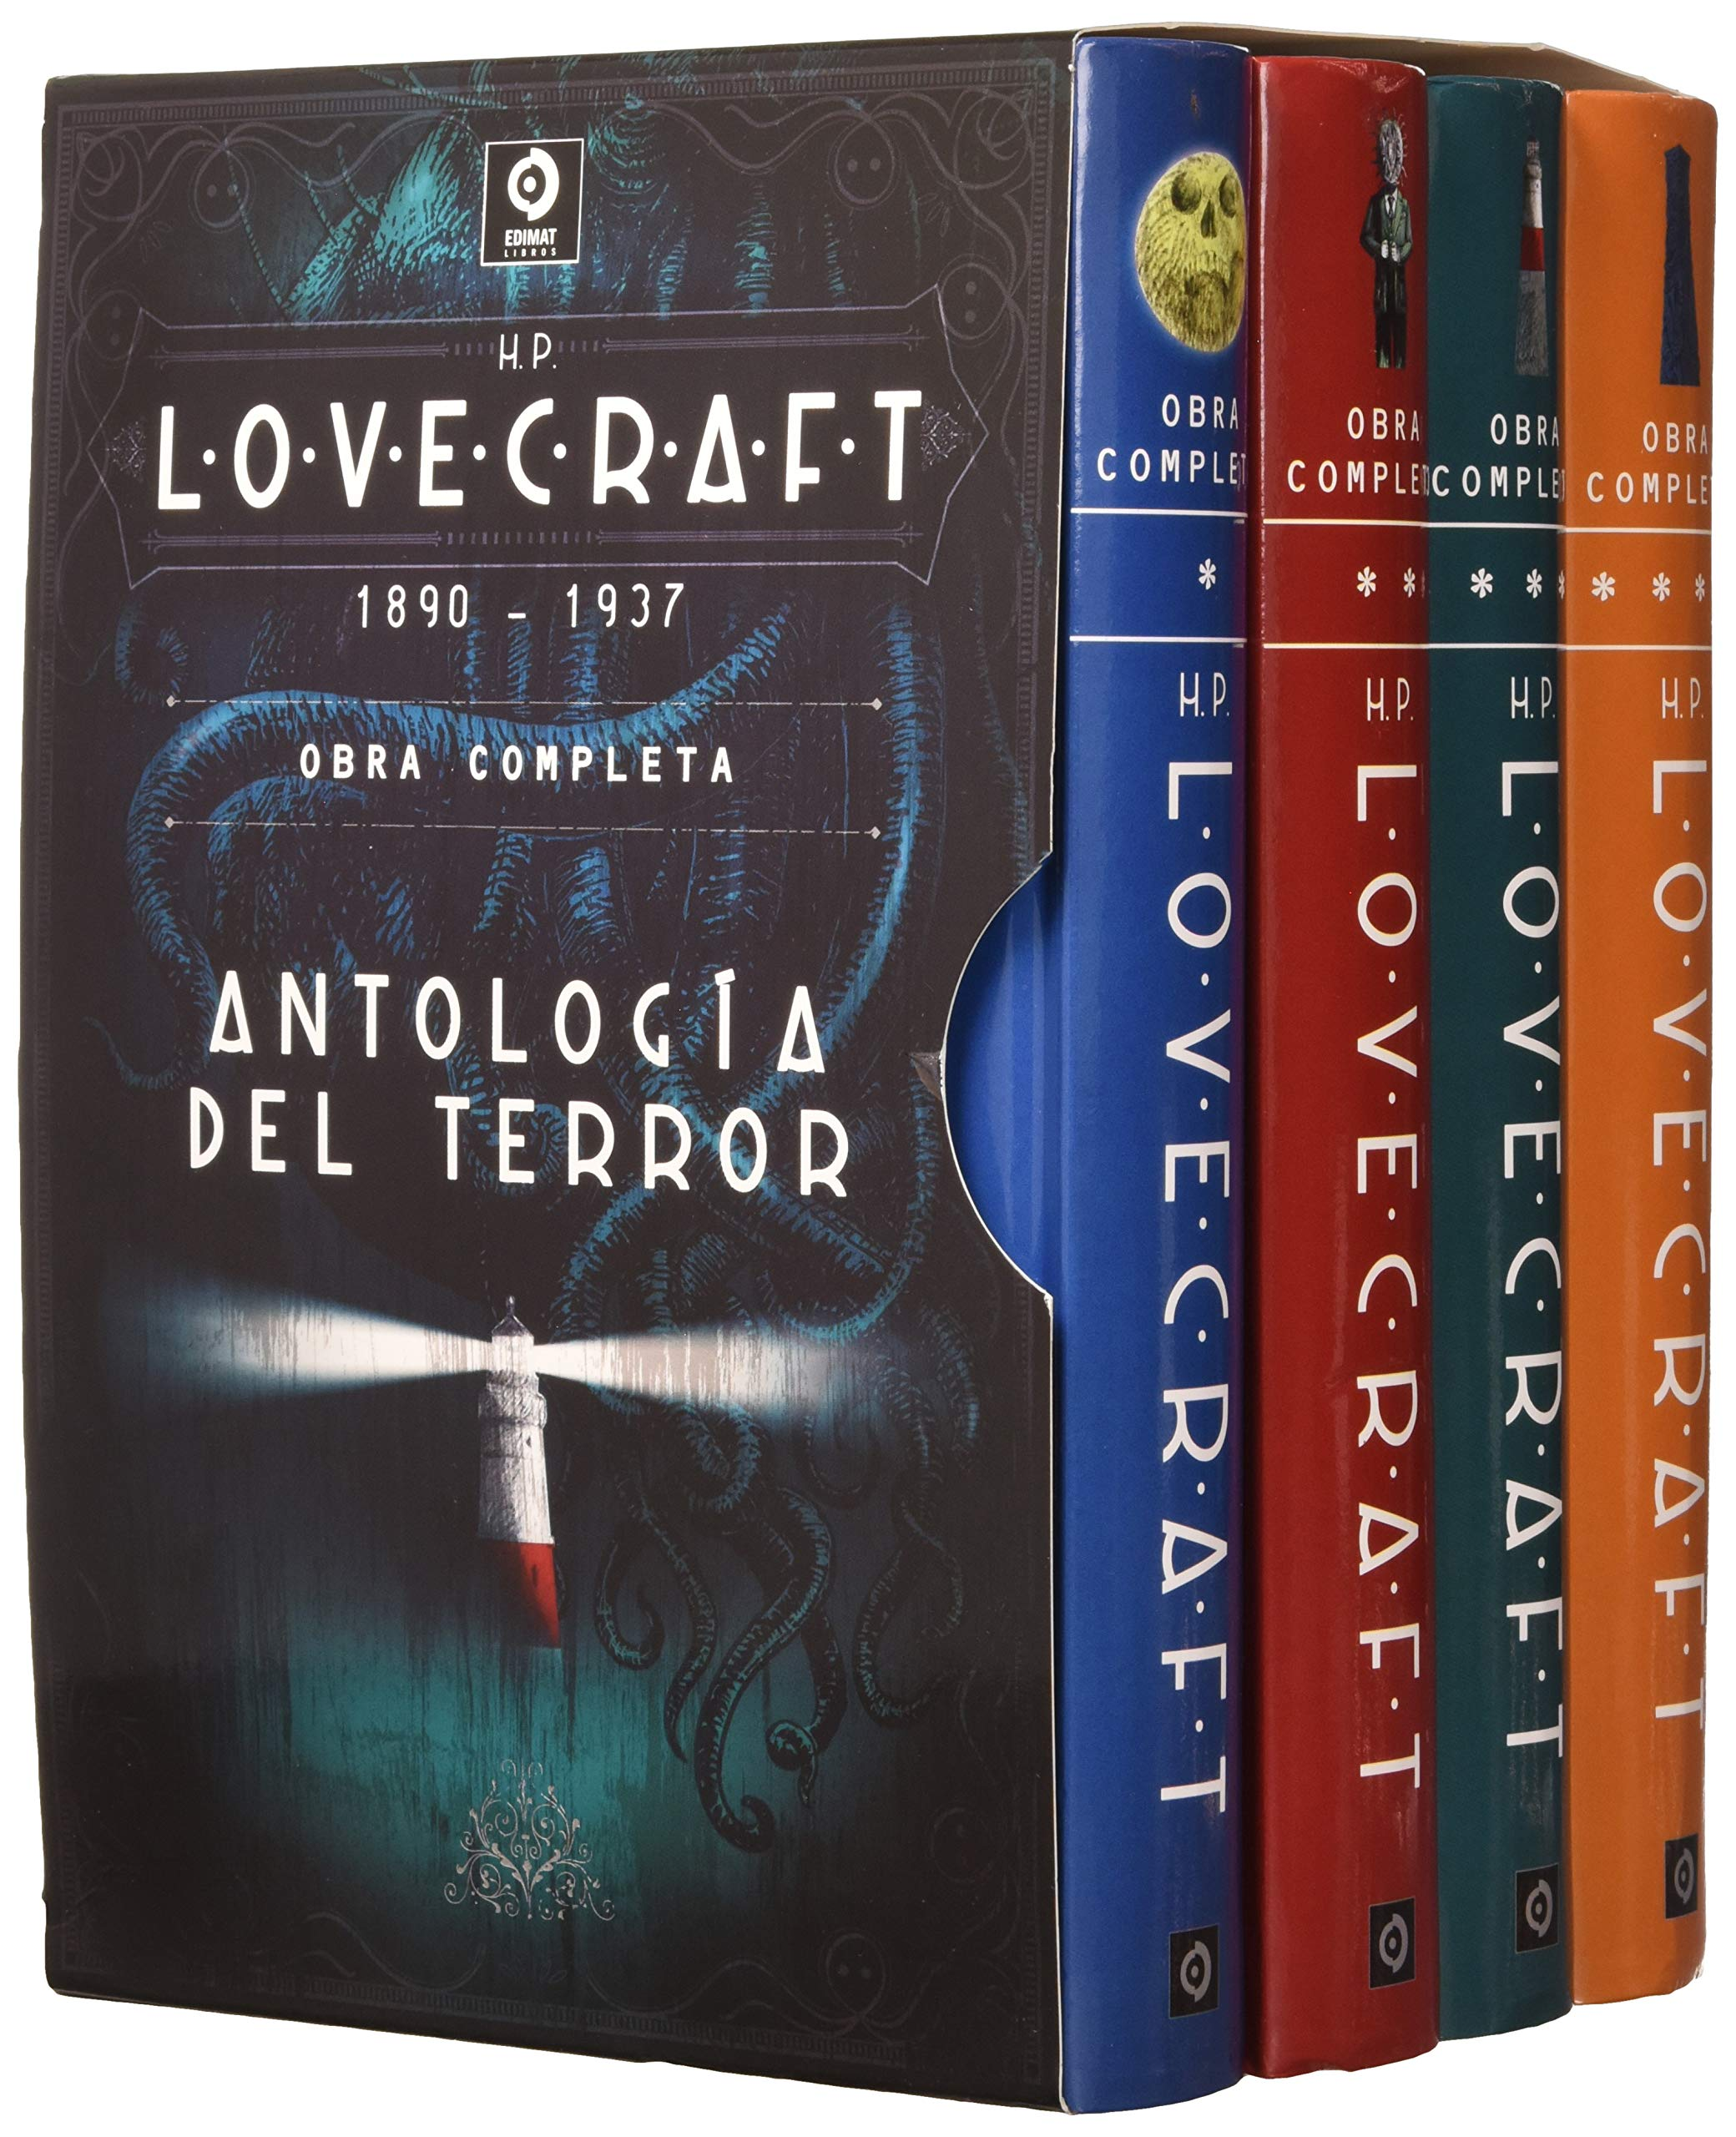 H.P. LOVECRAFT OBRA COMPLETA: Amazon.es: LOVECRAFT, H.P., BLANCO URGOITI, JAVIER, RUÍZ DE LUNA, PEDRO: Libros